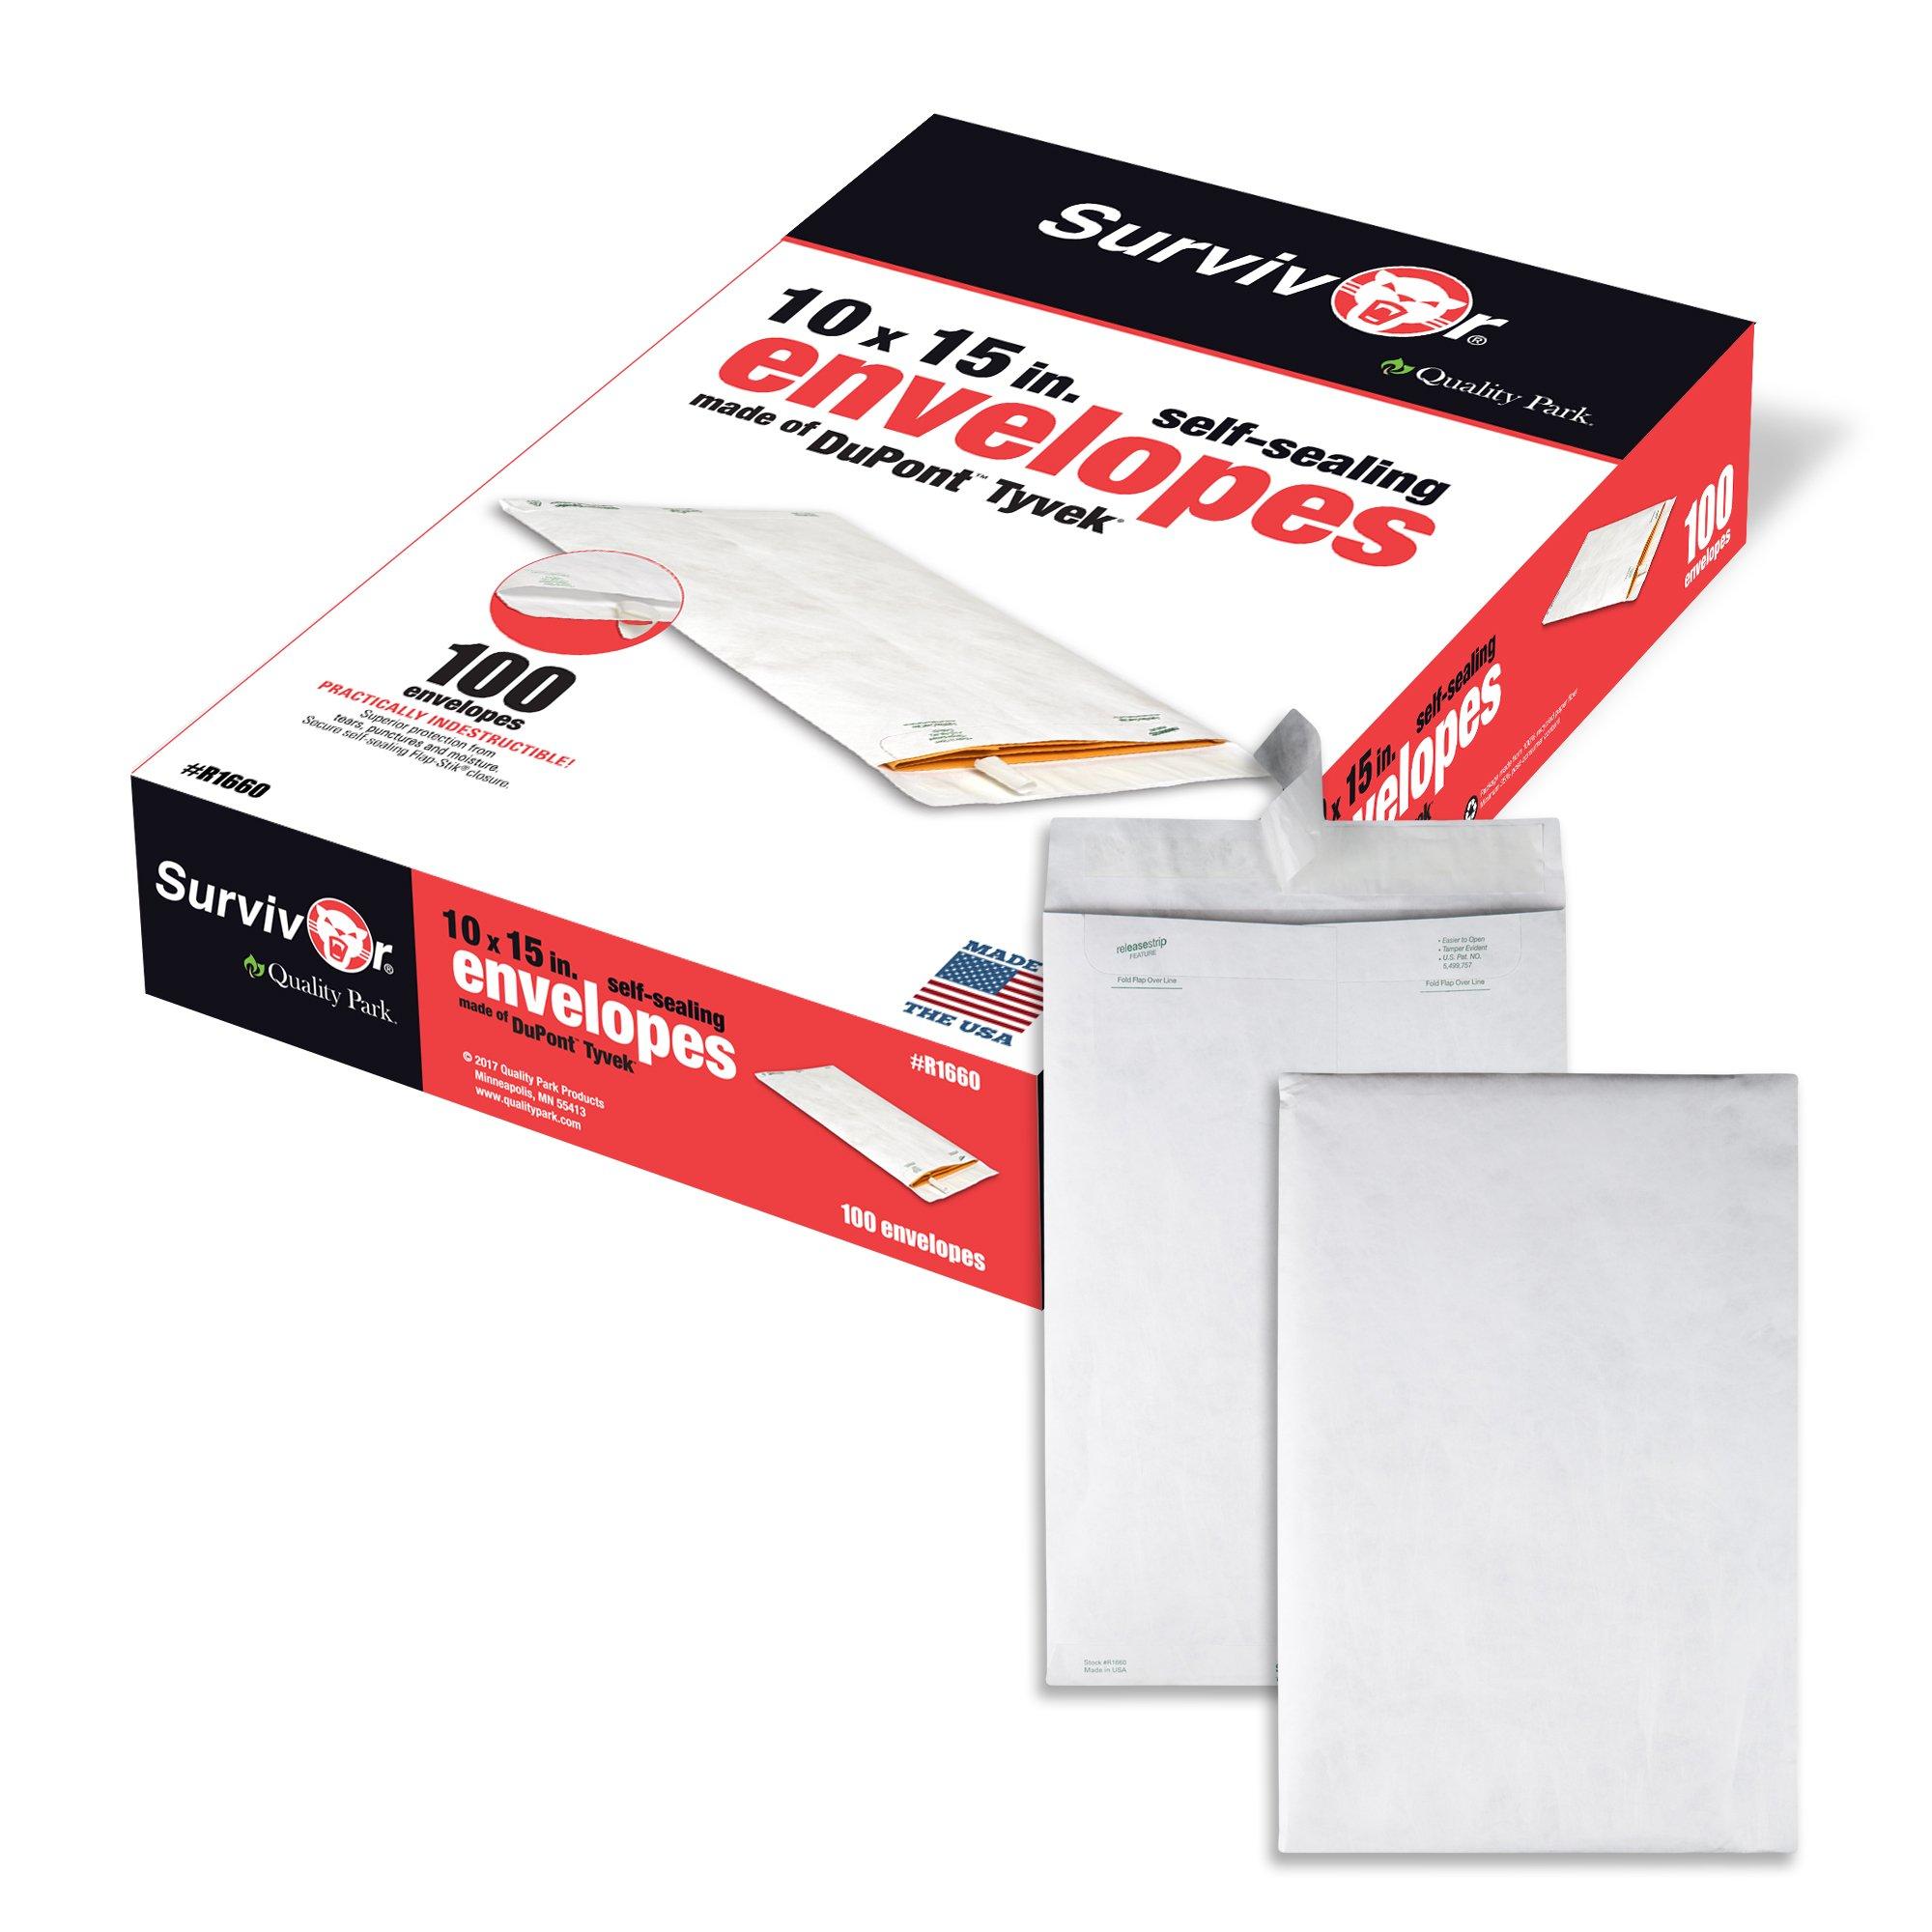 Quality Park QUAR1660 Survivor 10 x 15 Tyvek Catalog Mailer with Self Sealing Closure, 14 lb Puncture, Tear and Moisture Resistant Dupont Tyvek Envelopes, 100 per Box (R1660) by Quality Park